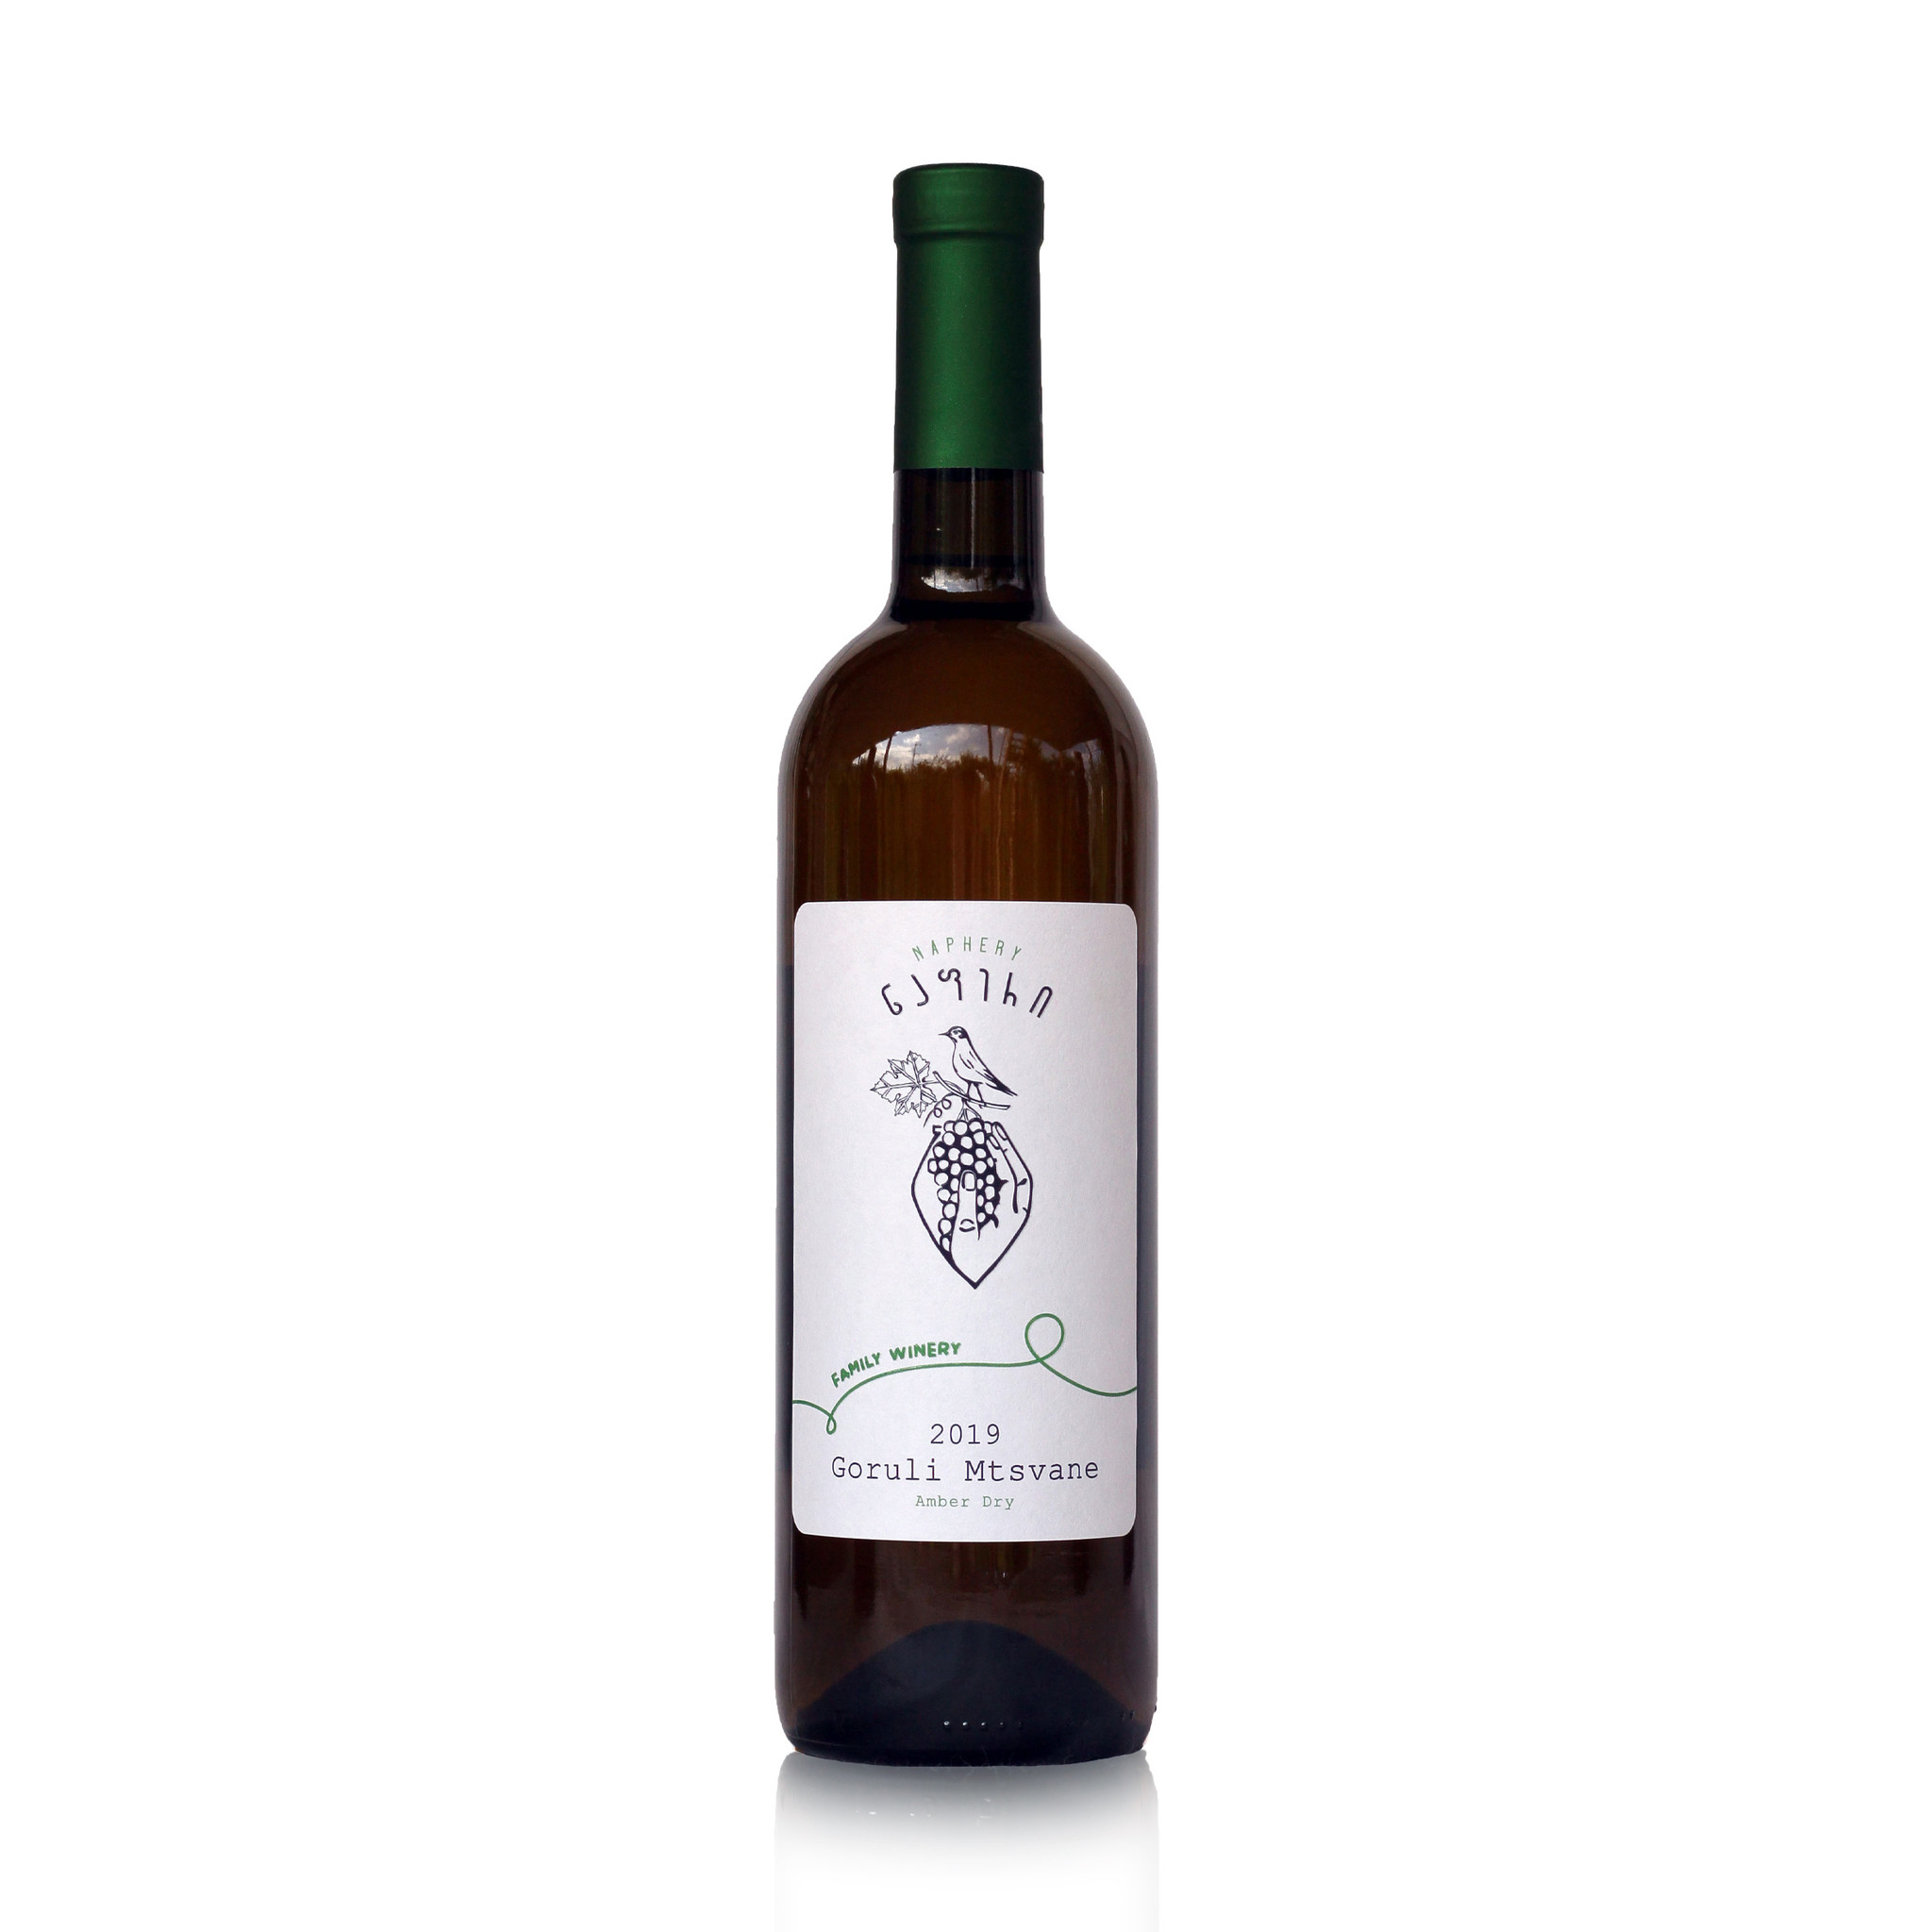 Napheri Napheri, Goruli Mtsvane Amber-dry Qvevri wine 2019